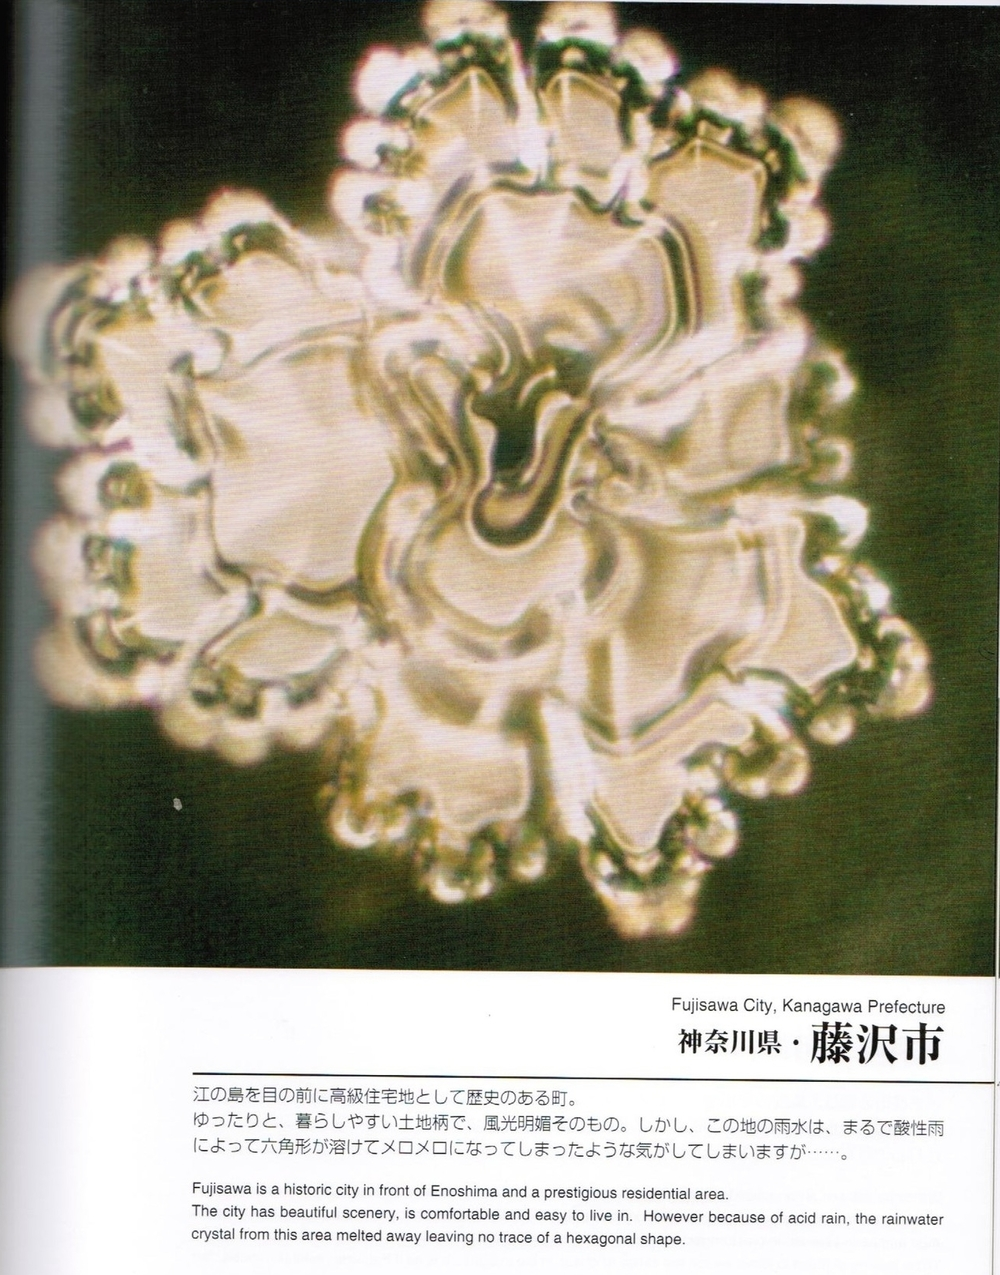 dr emoto crystals city fujisawa rain water 001.jpg